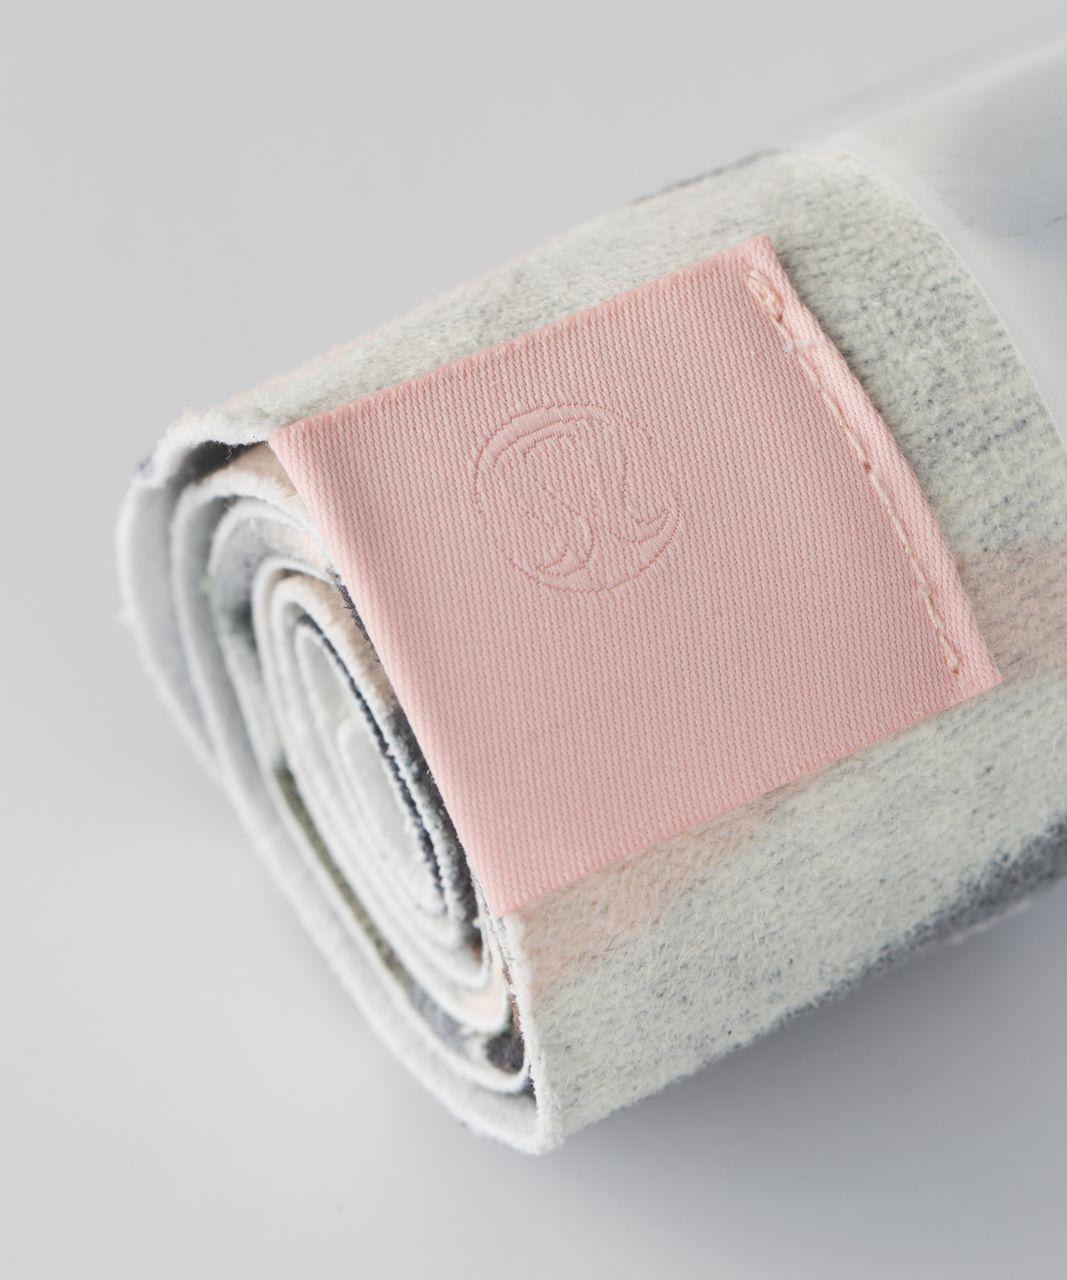 Lululemon The (Small) Towel - Coast Camo Butter Pink Multi